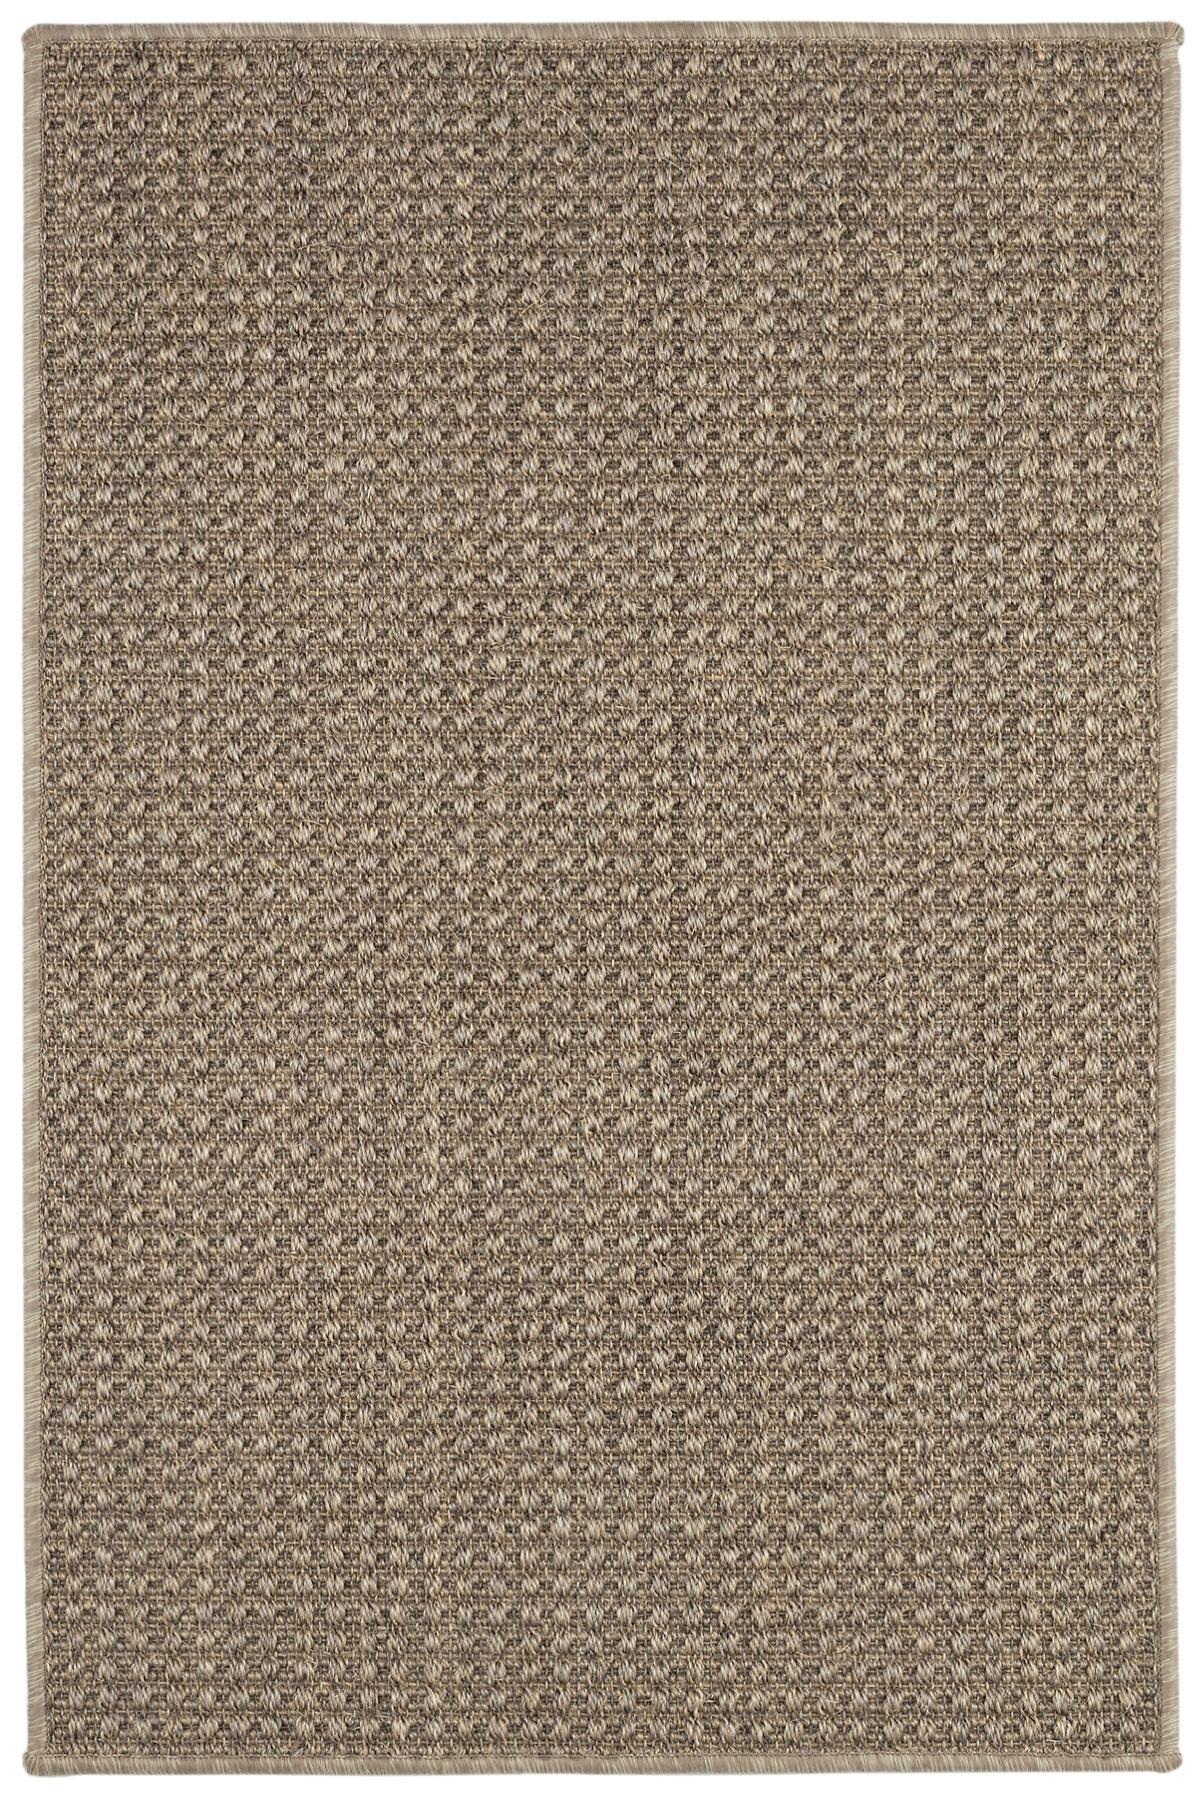 Ashburn Taupe Woven Sisal Custom Rug